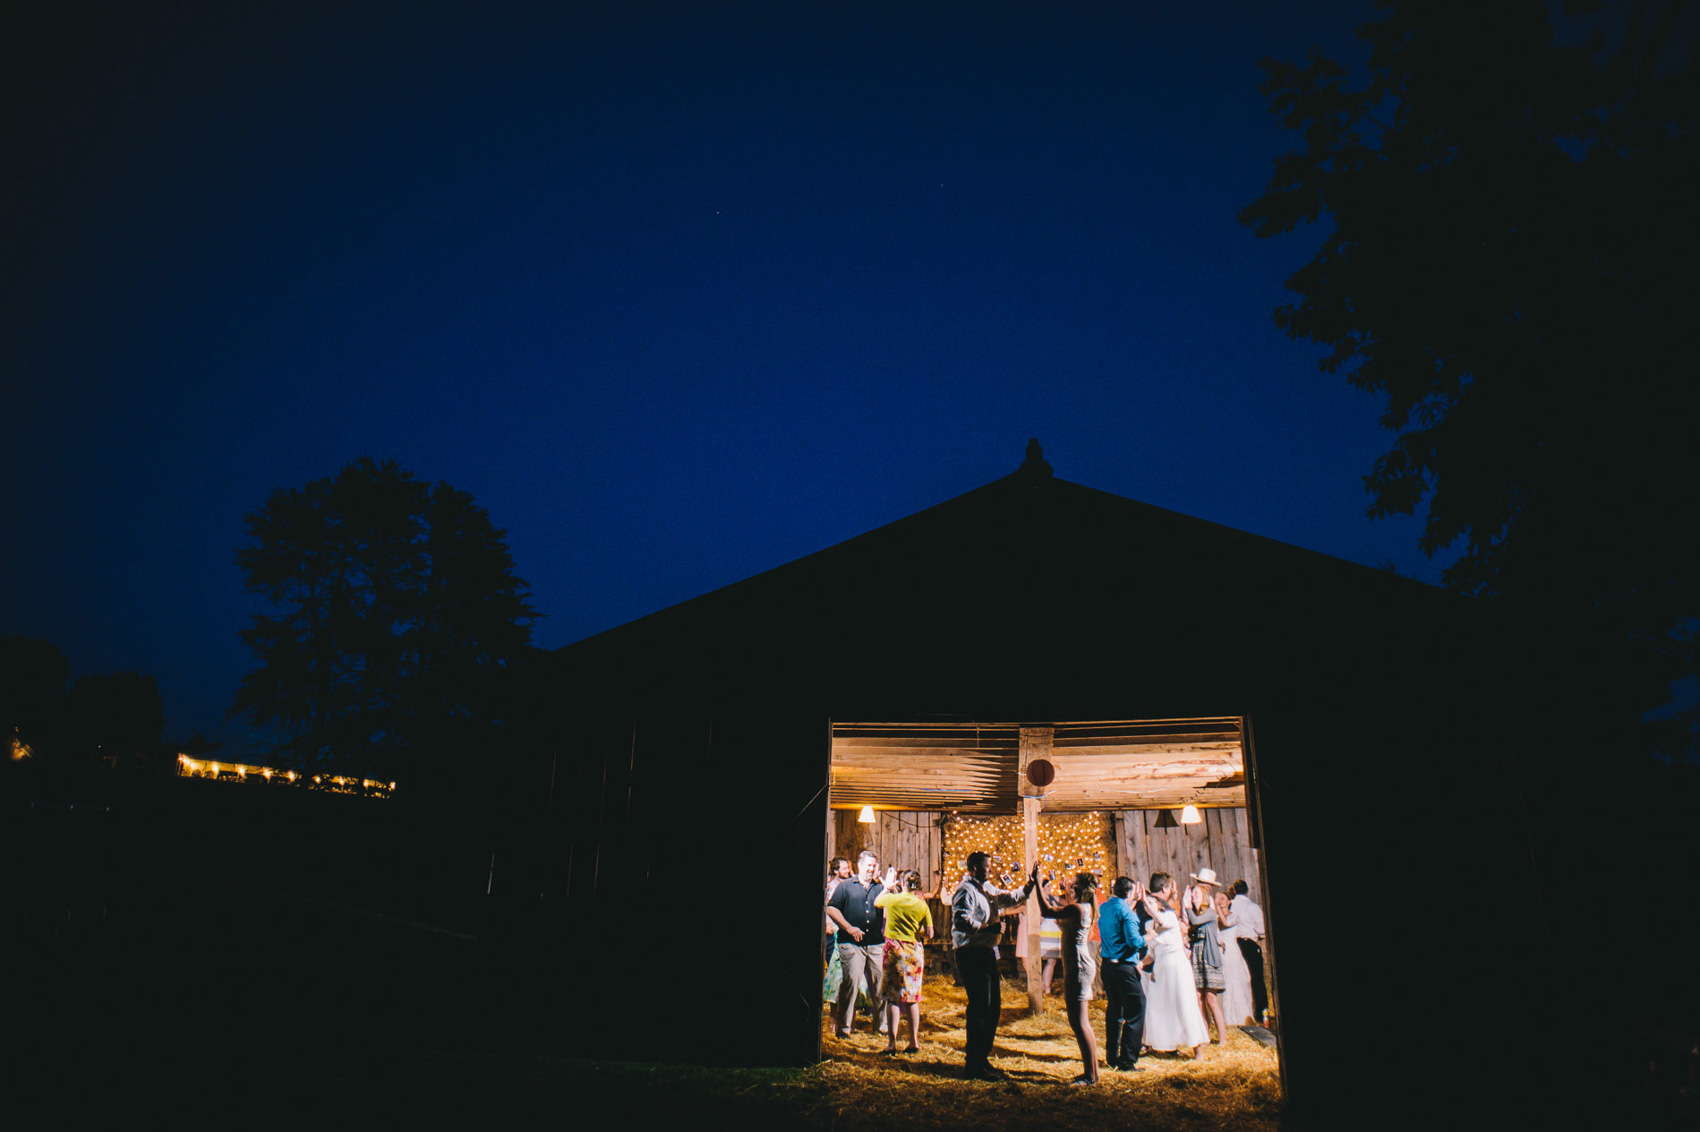 012-oberports-wedding-reception-portfolio